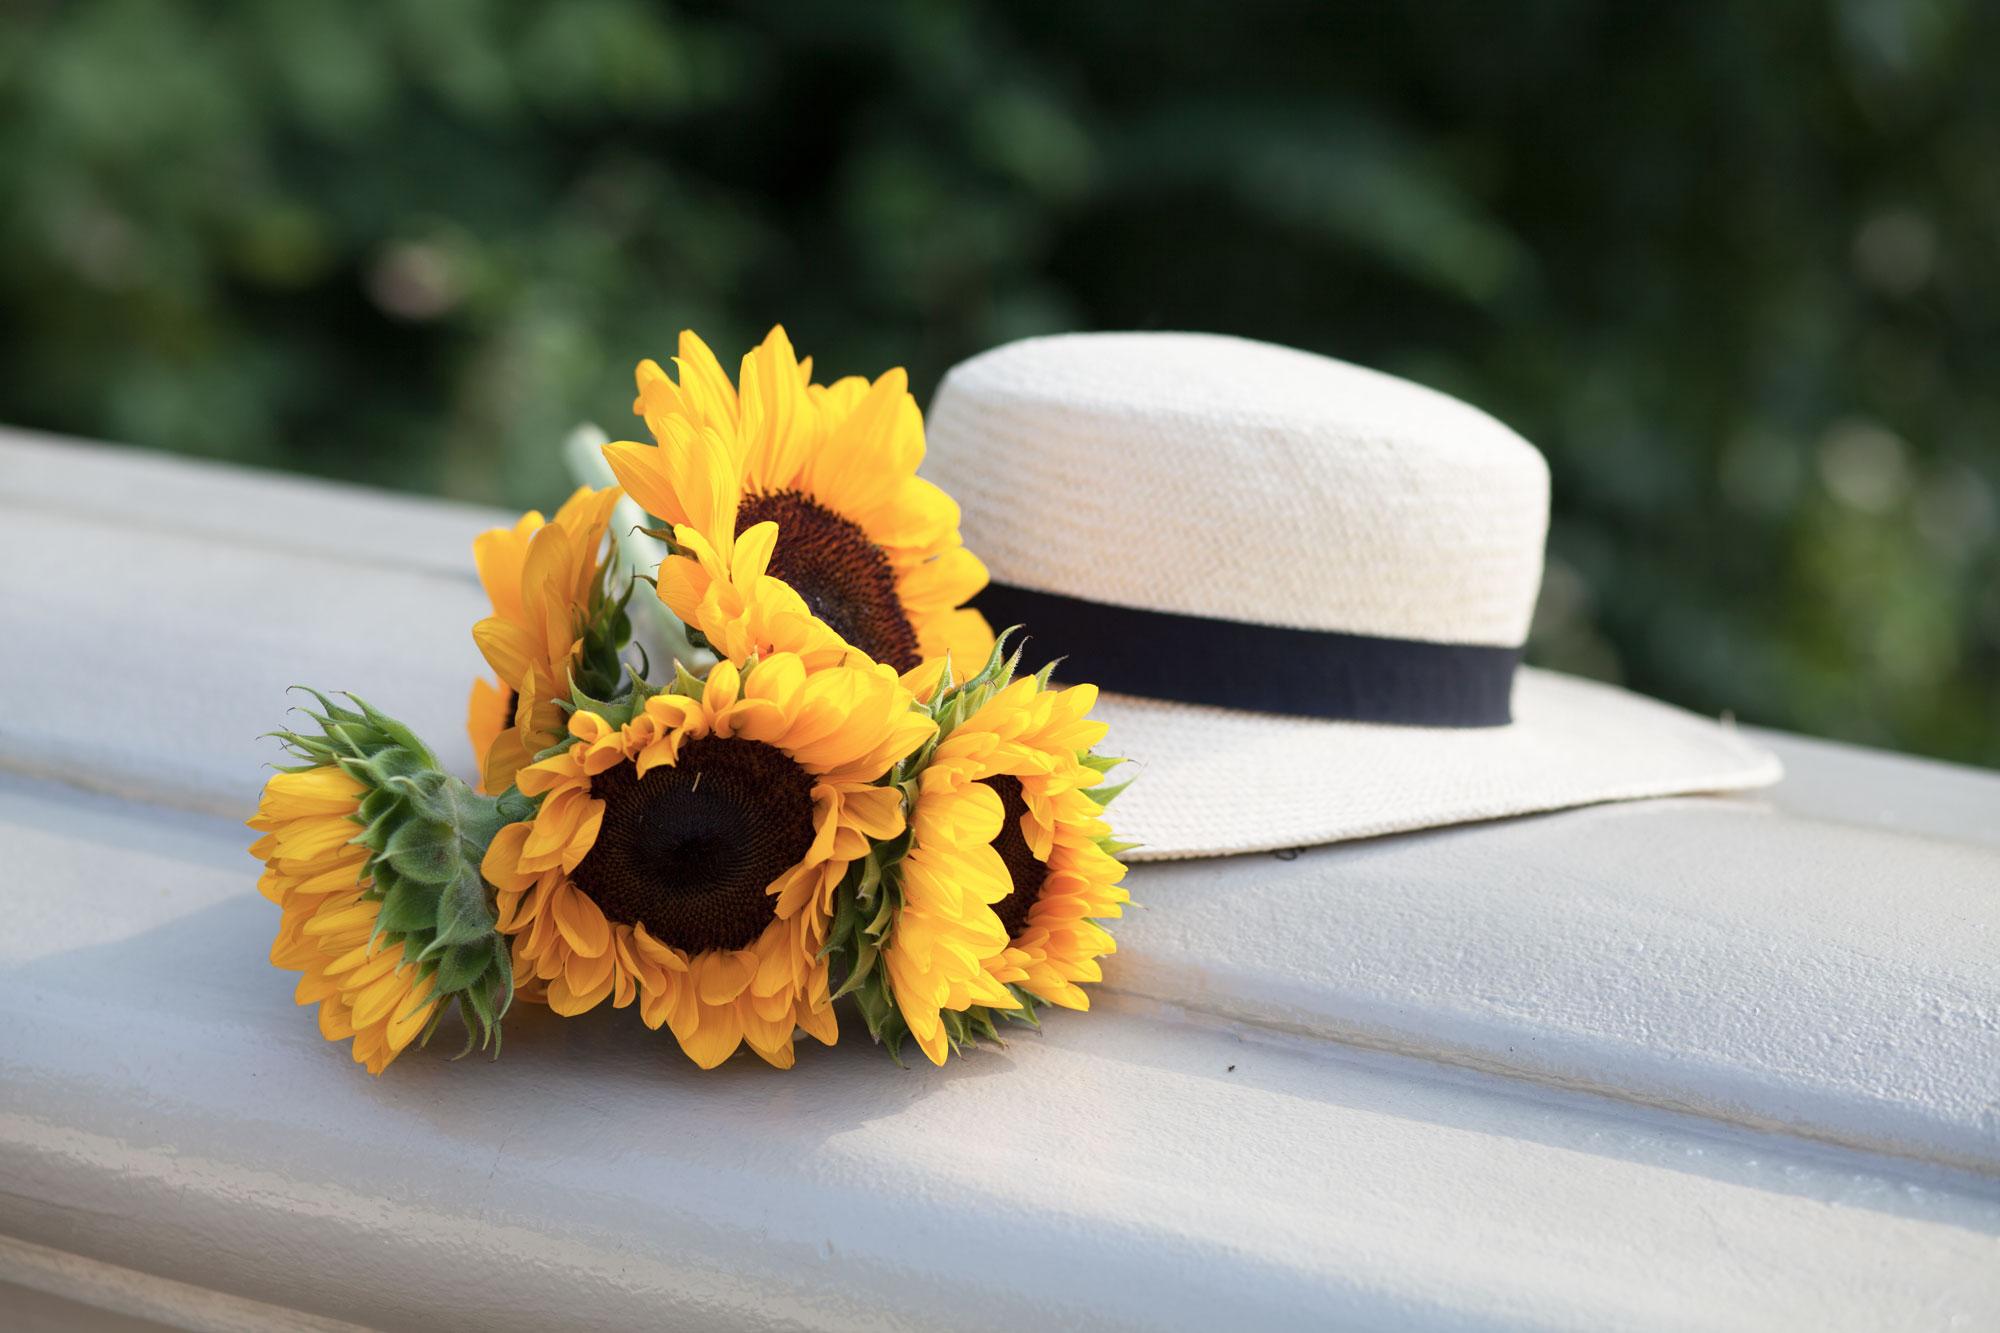 white-blazer-plaid-jcrew-dress-gold-sandals-straw-hat-casual-weekend-style-summer-fashion-blogger-blog-ny-new-york-corporate-catwalk10